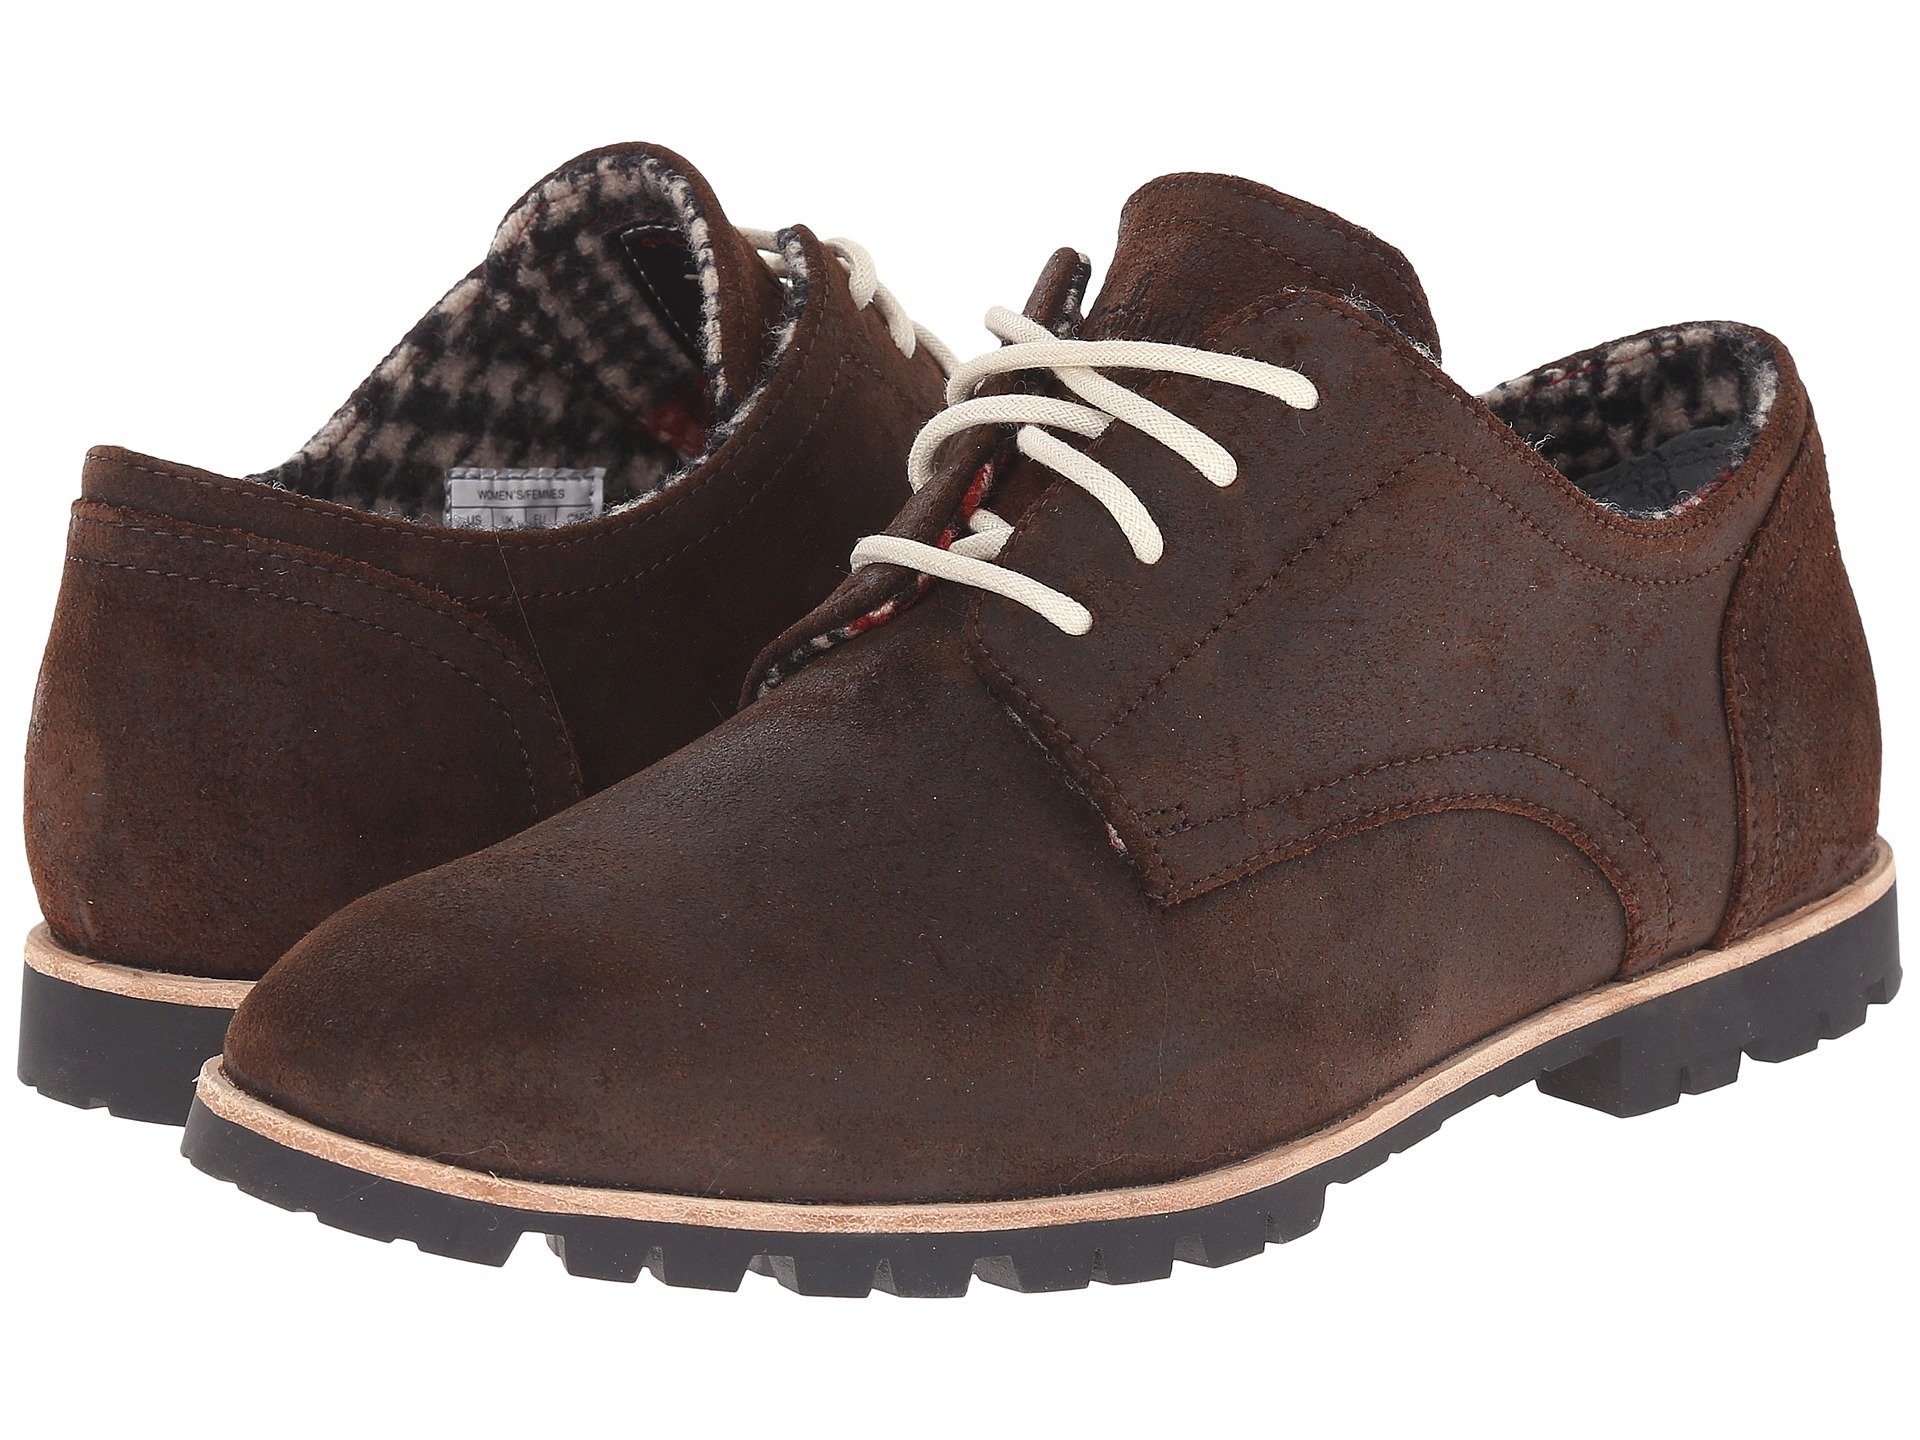 Zapato Casual para Mujer Woolrich Adams Leather  + Woolrich en VeoyCompro.net